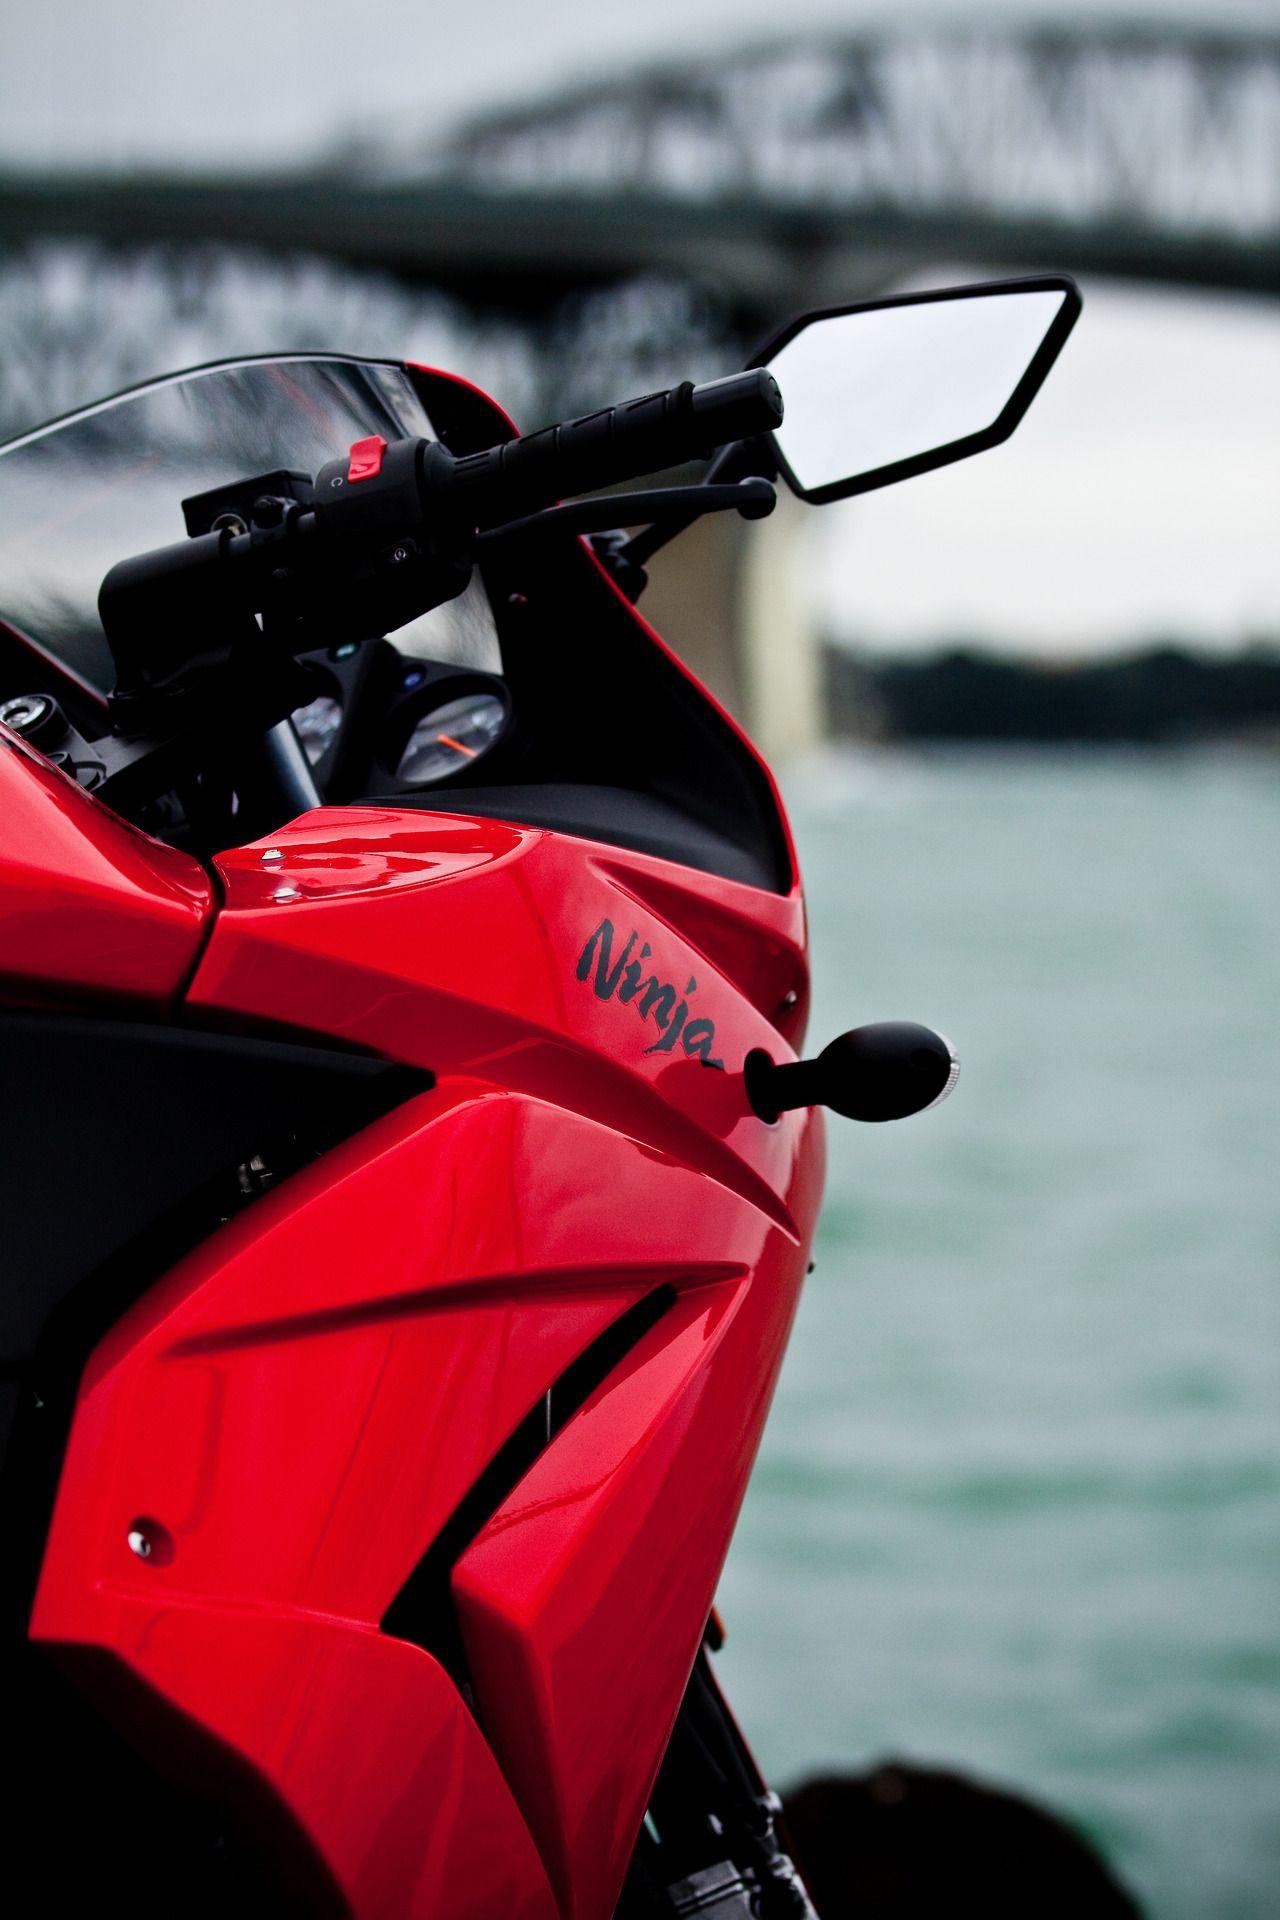 Kawasaki Ninja Kawasaki Ninja Motos Auto